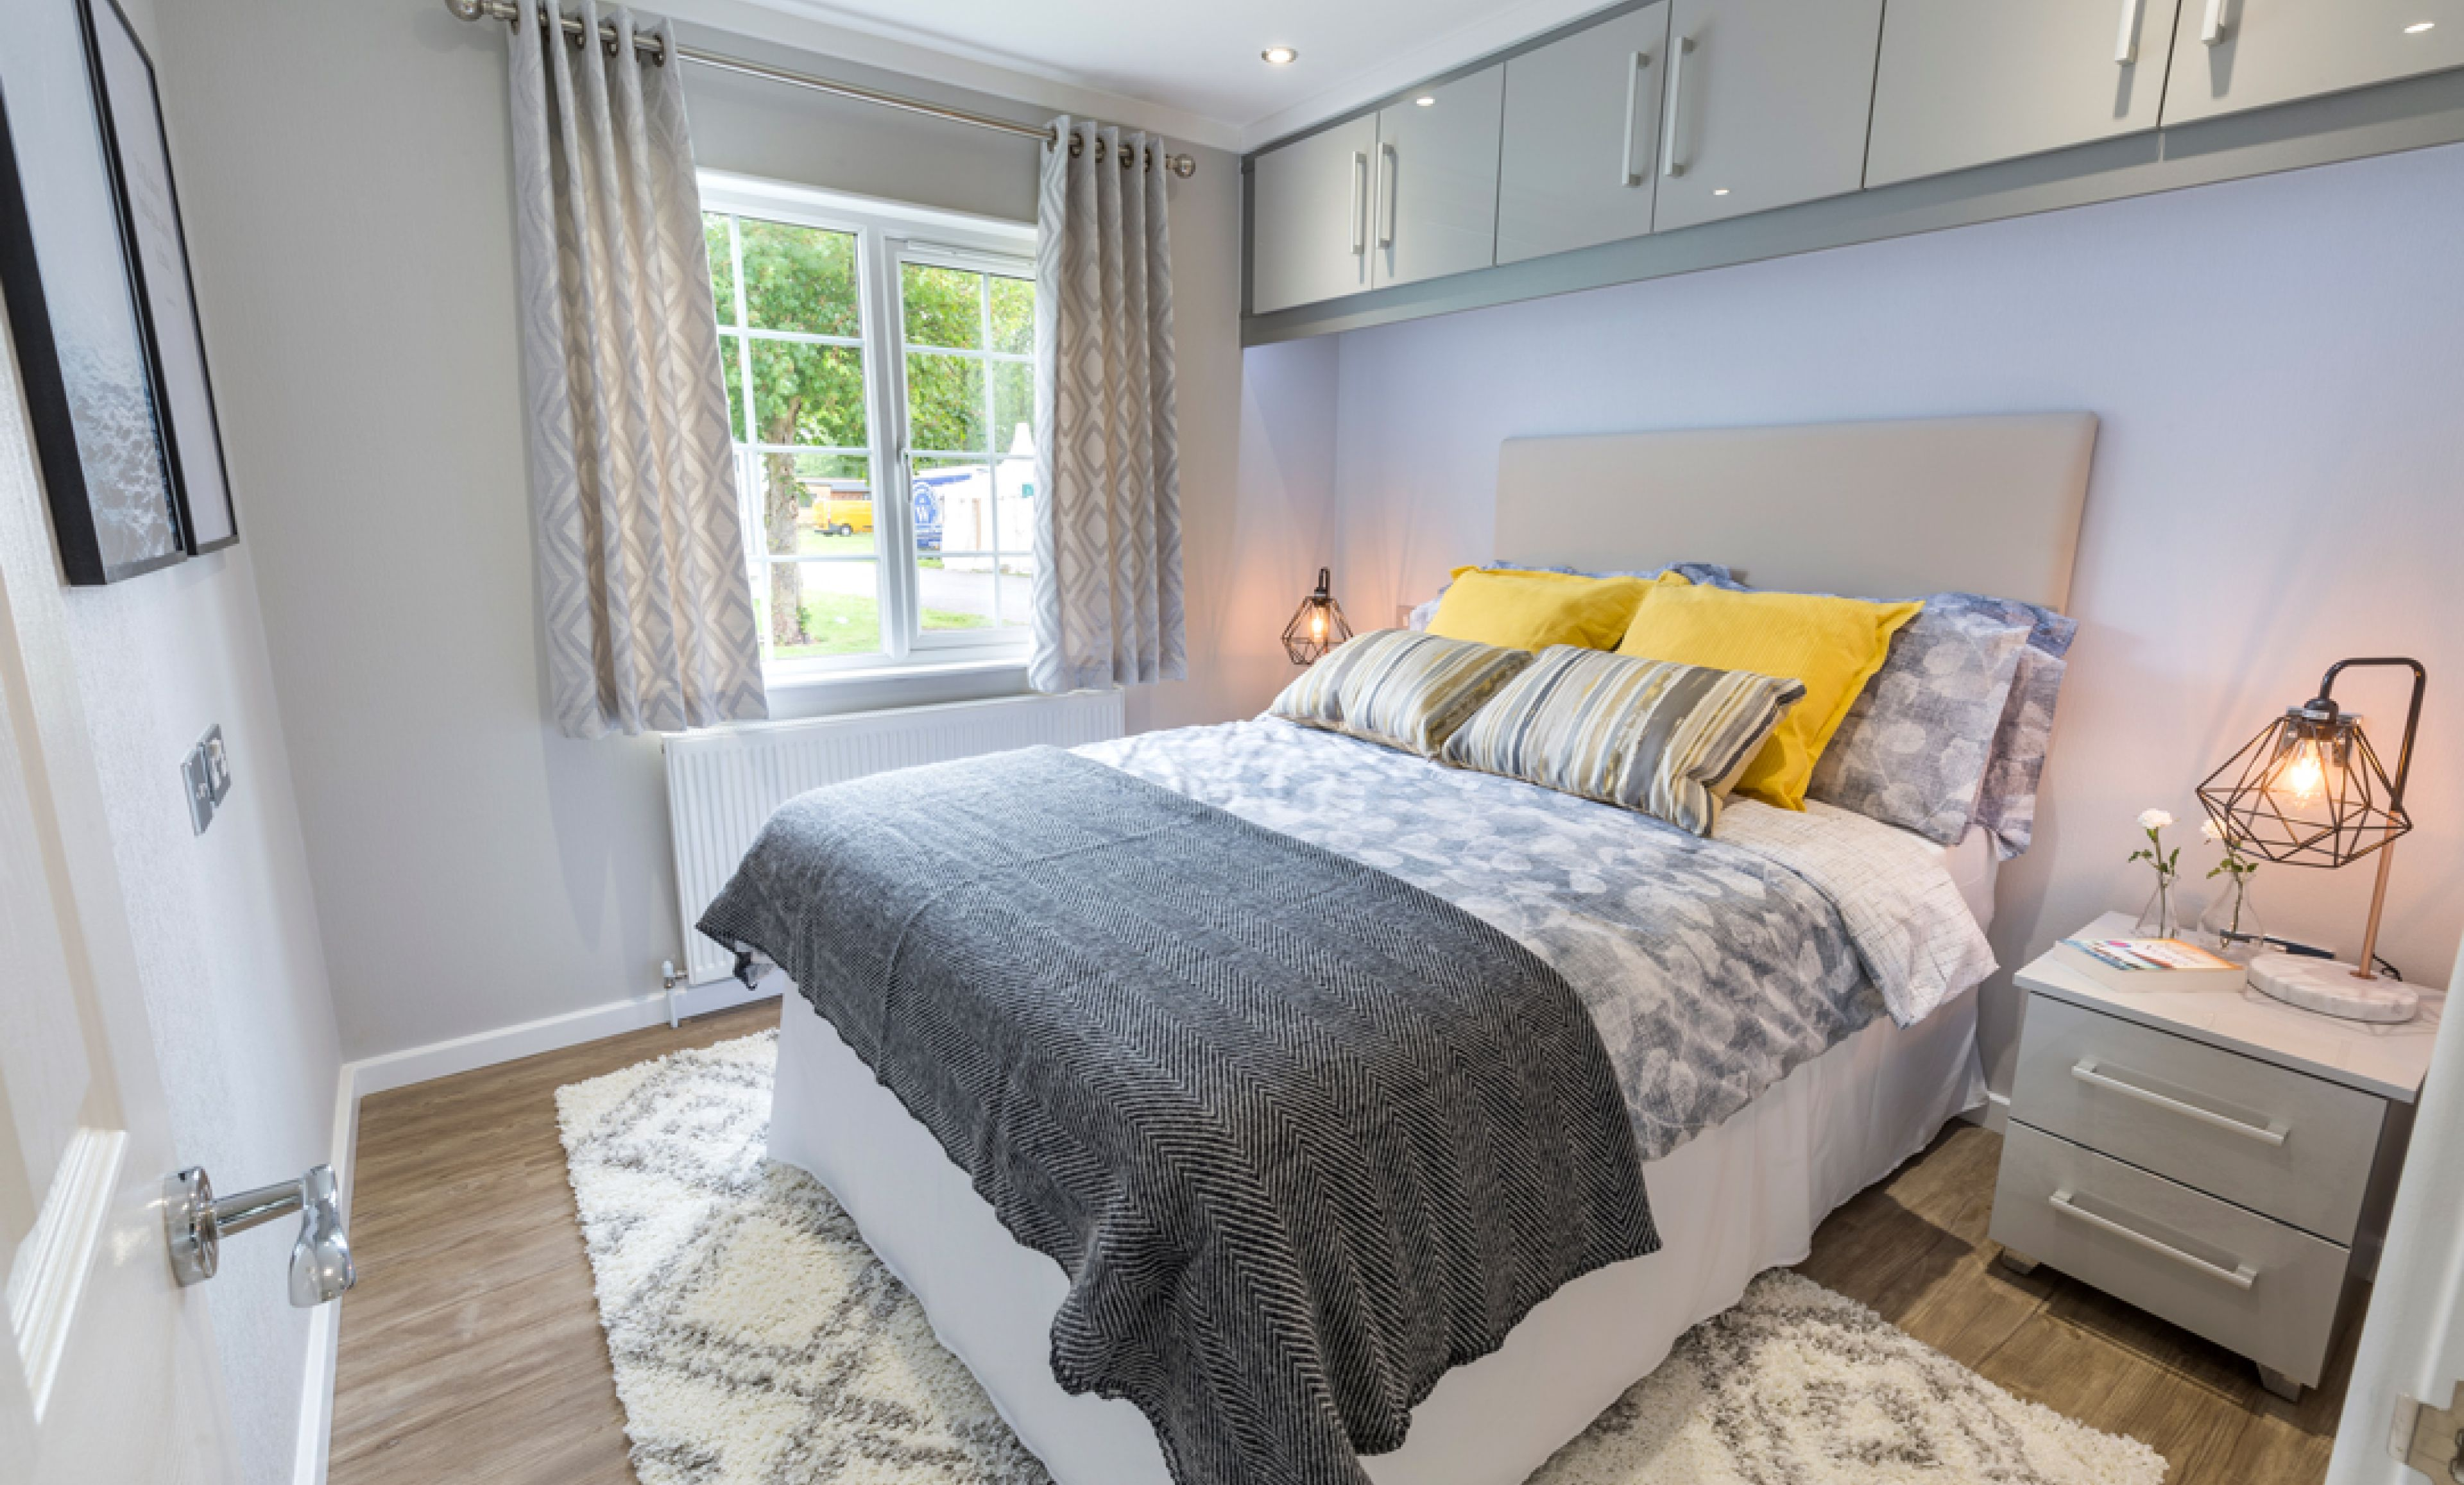 The Kensington bedroom